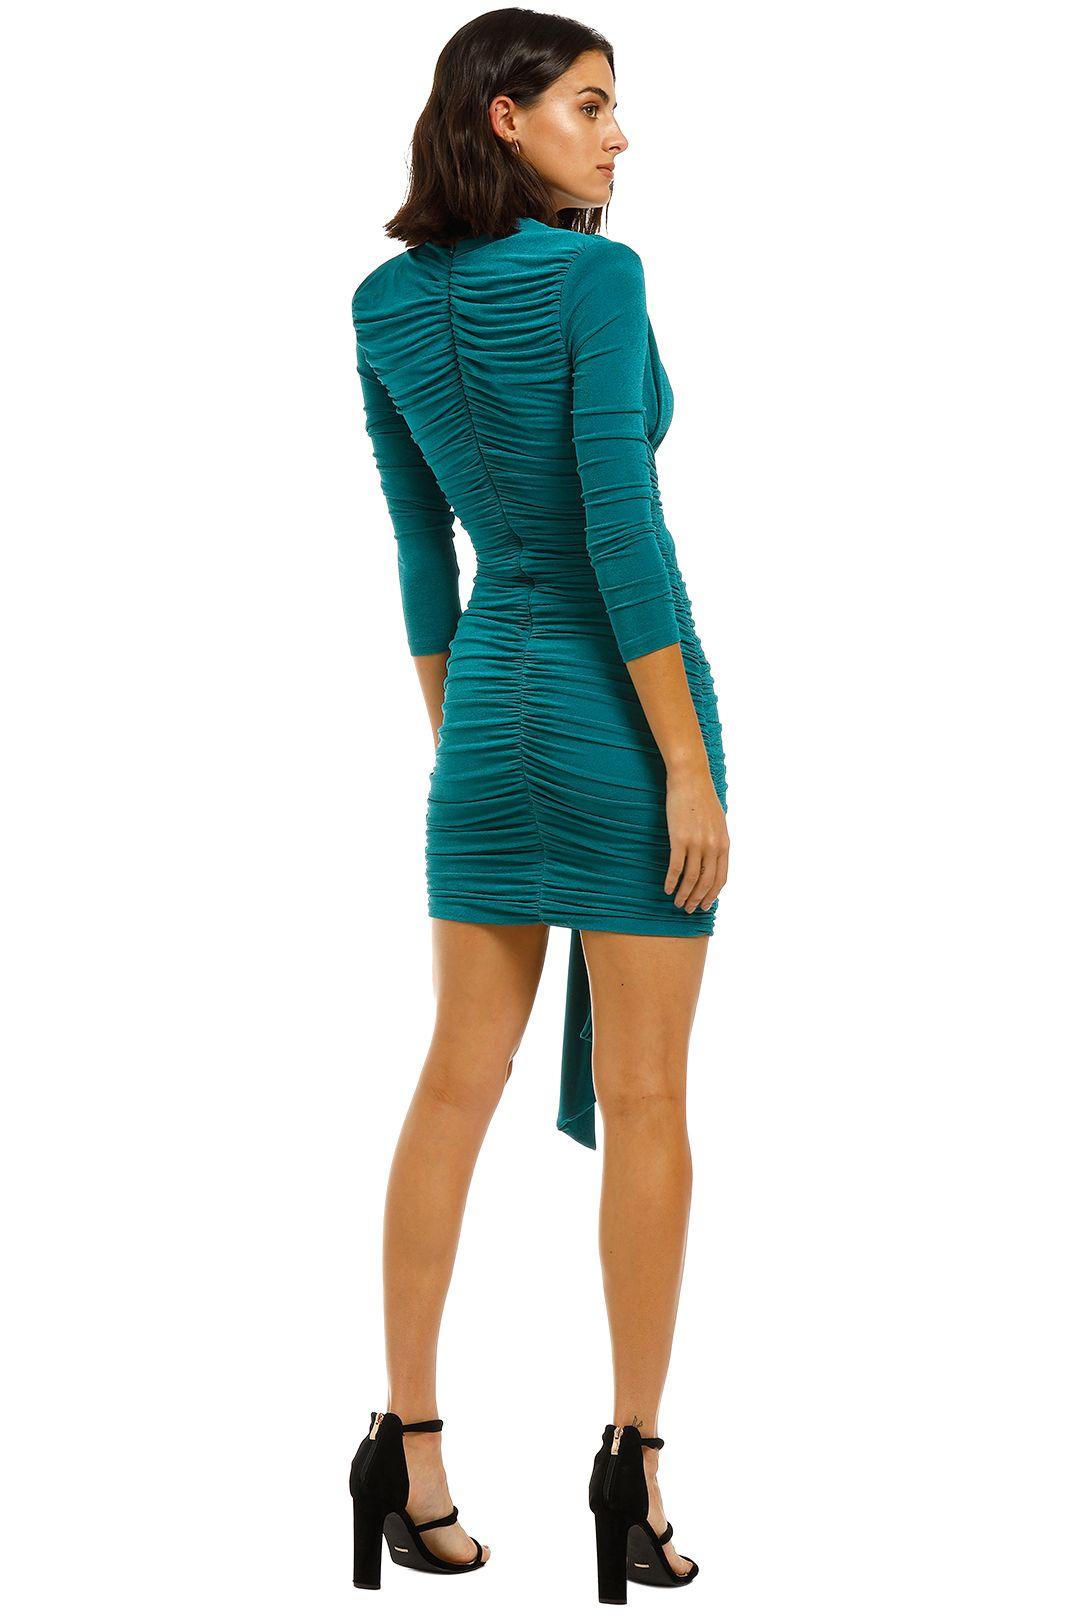 Misha-Paola-Dress-Emerald-Back